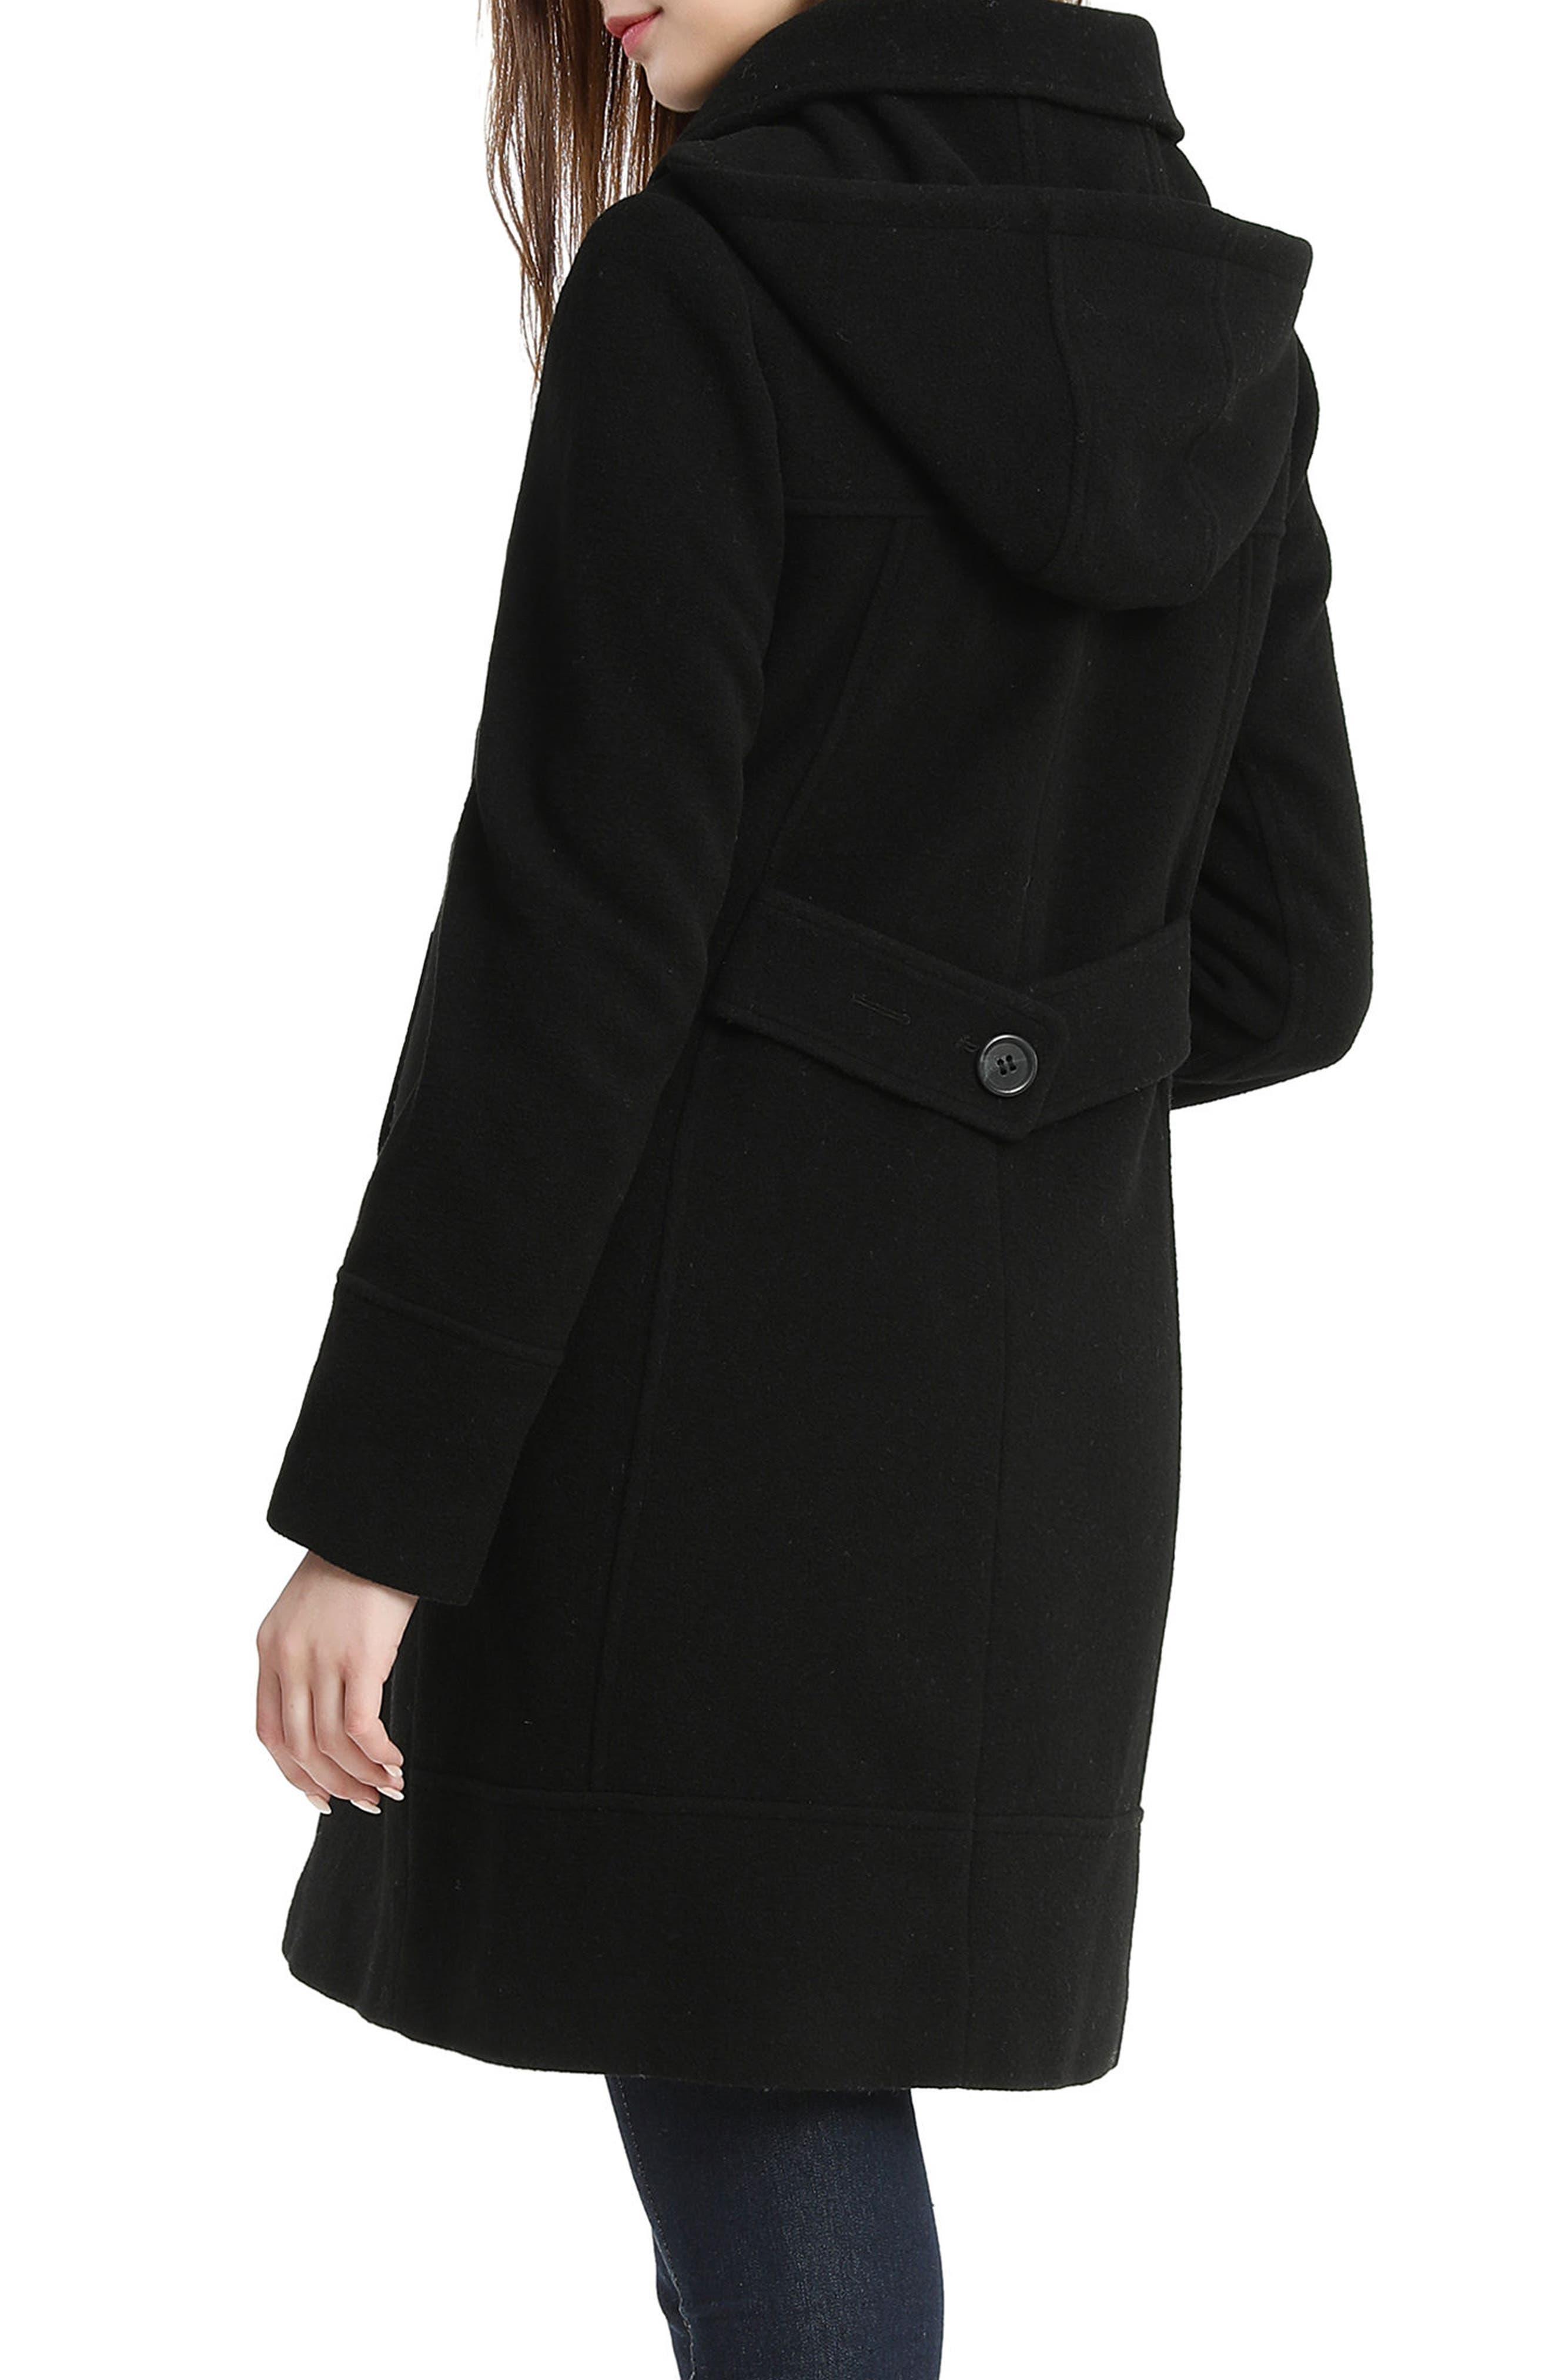 Wool Blend Maternity Coat,                             Alternate thumbnail 2, color,                             BLACK